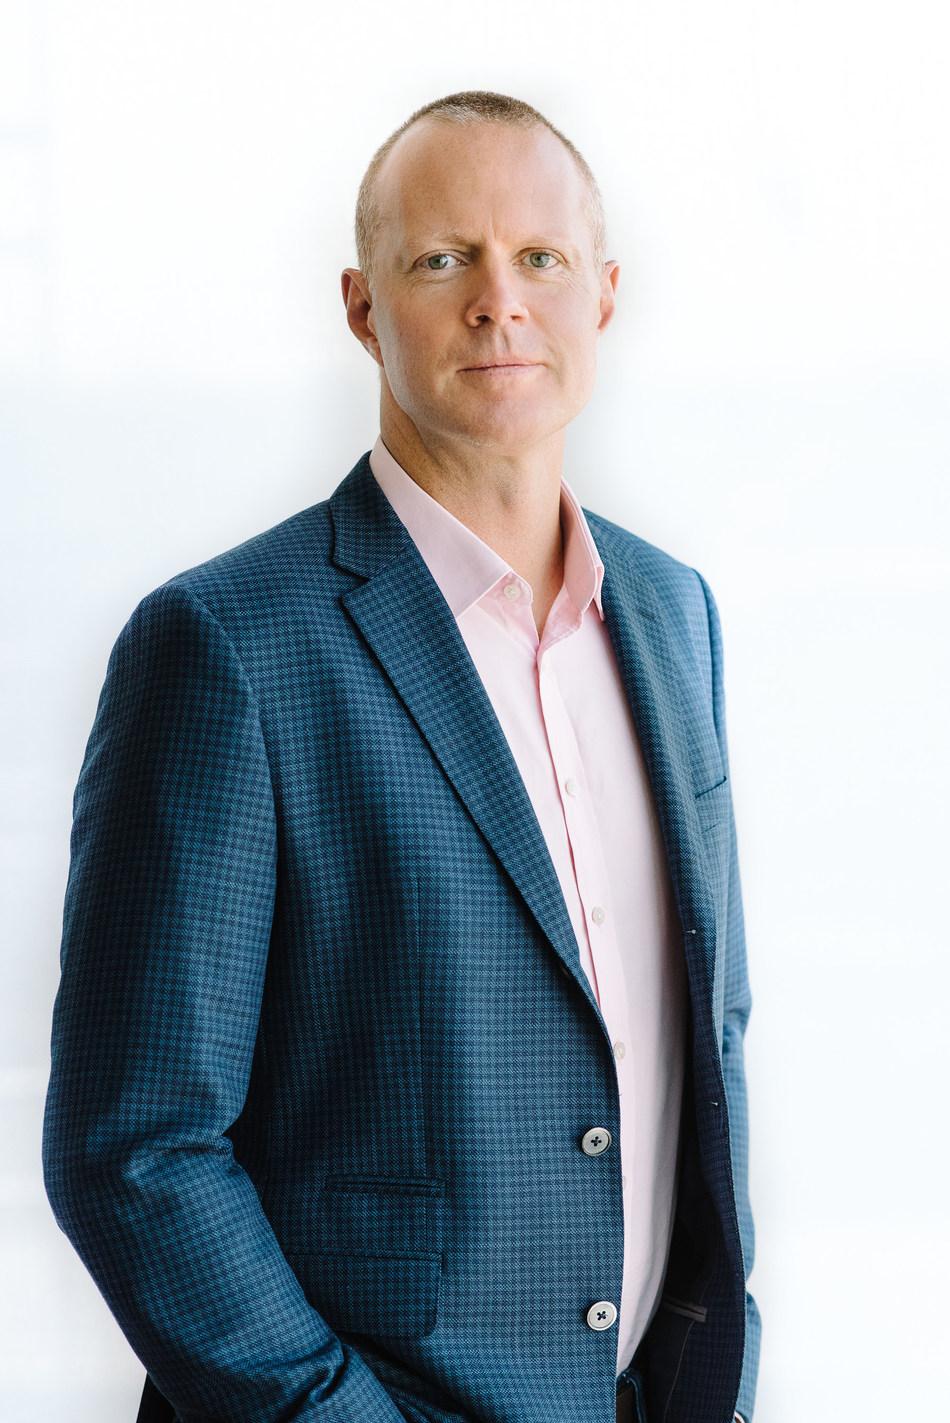 Jason Storah, Chief Executive Officer, Aviva Canada (CNW Group/Aviva Canada Inc.)